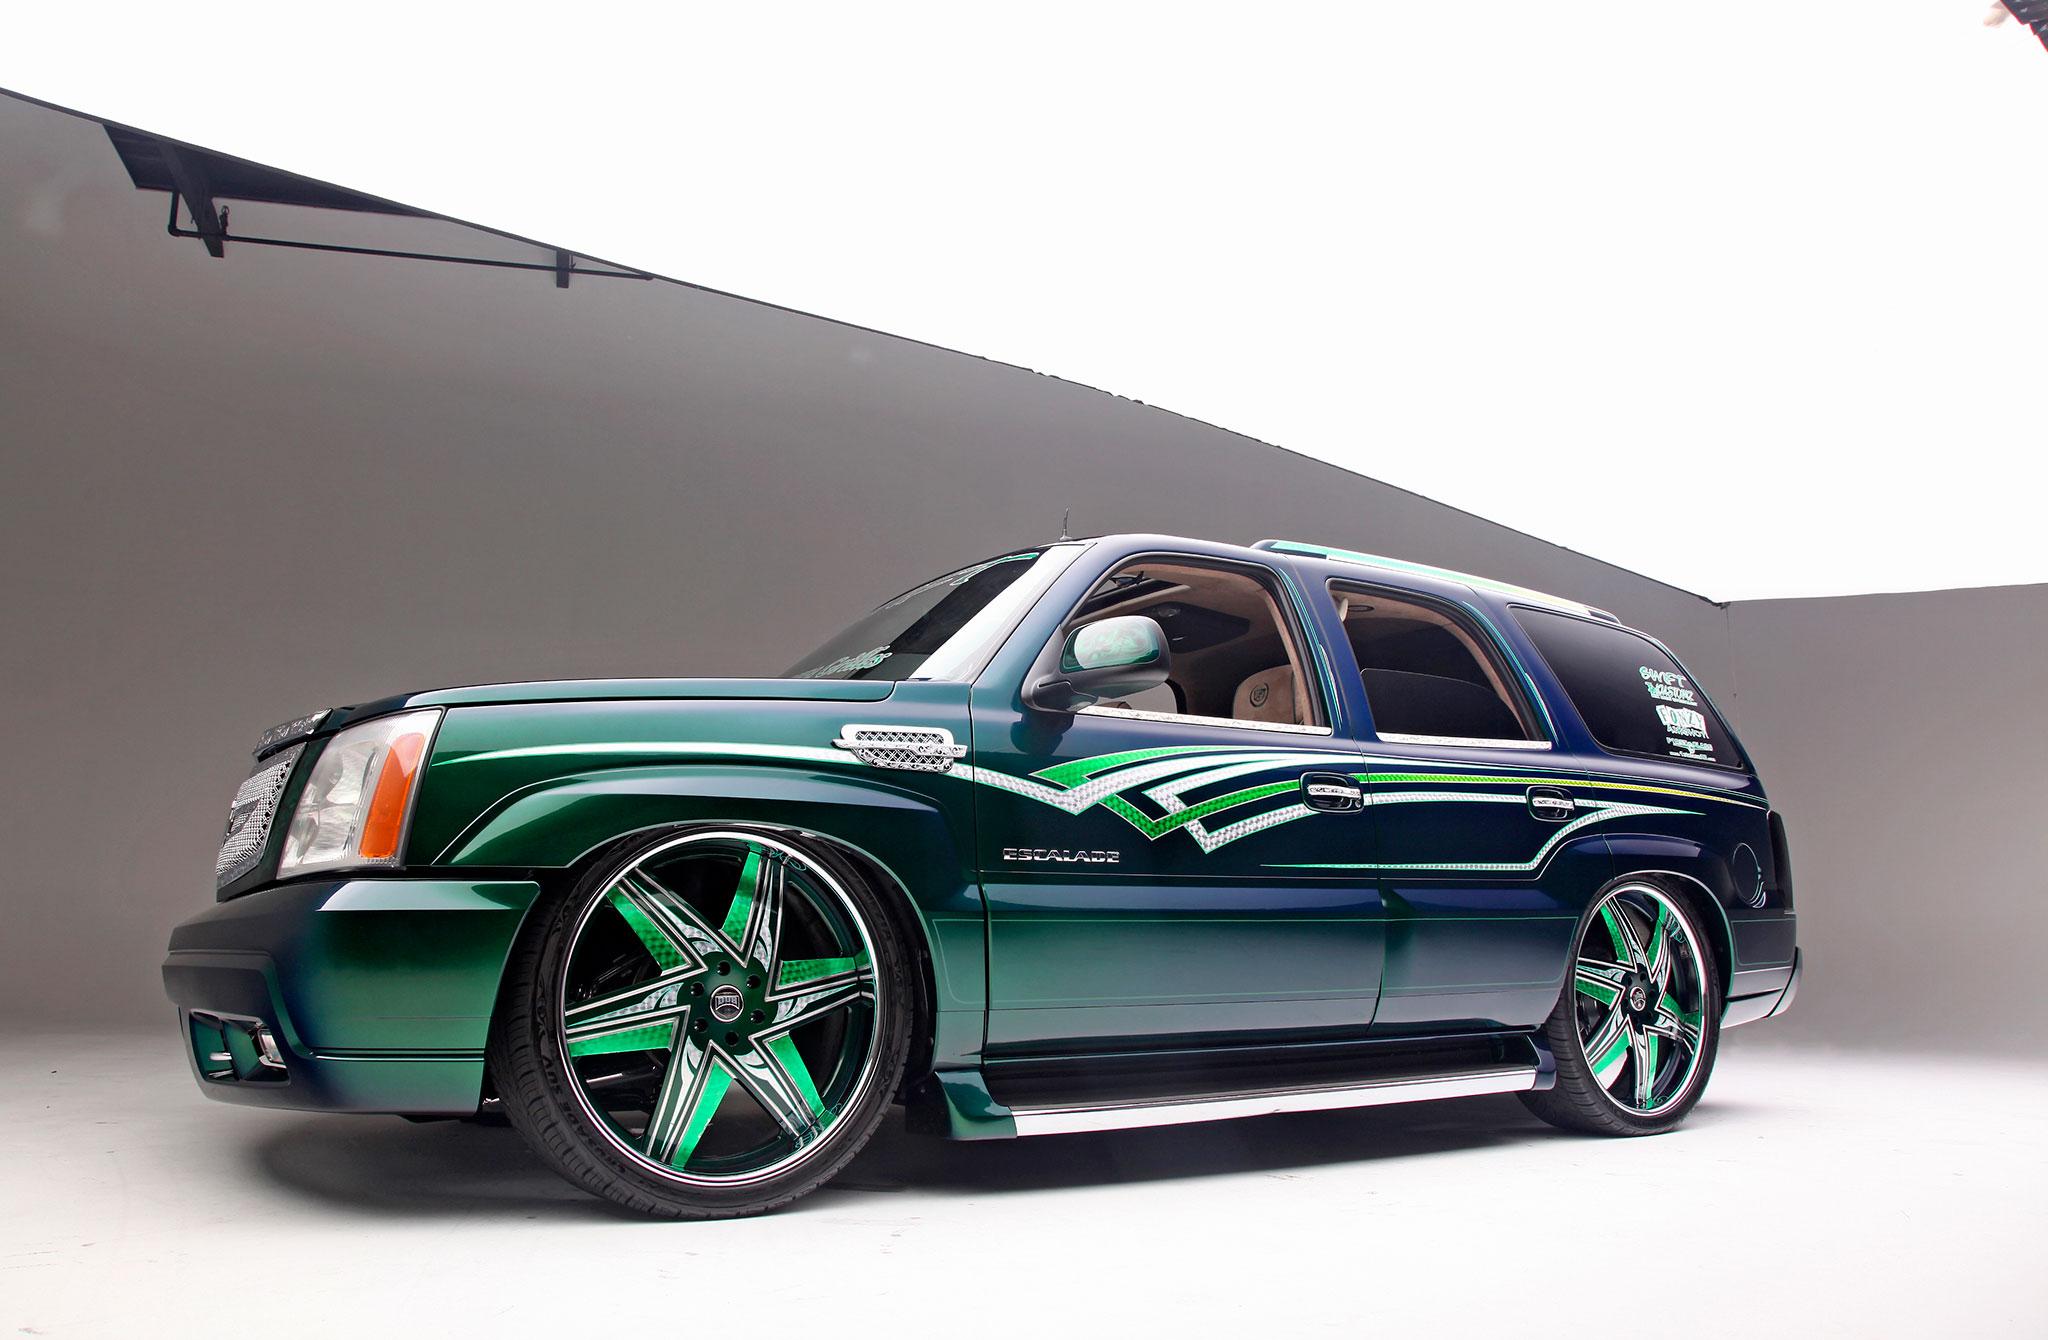 Cadillac Escalade Mht C Wheels on 2002 Buick Regal